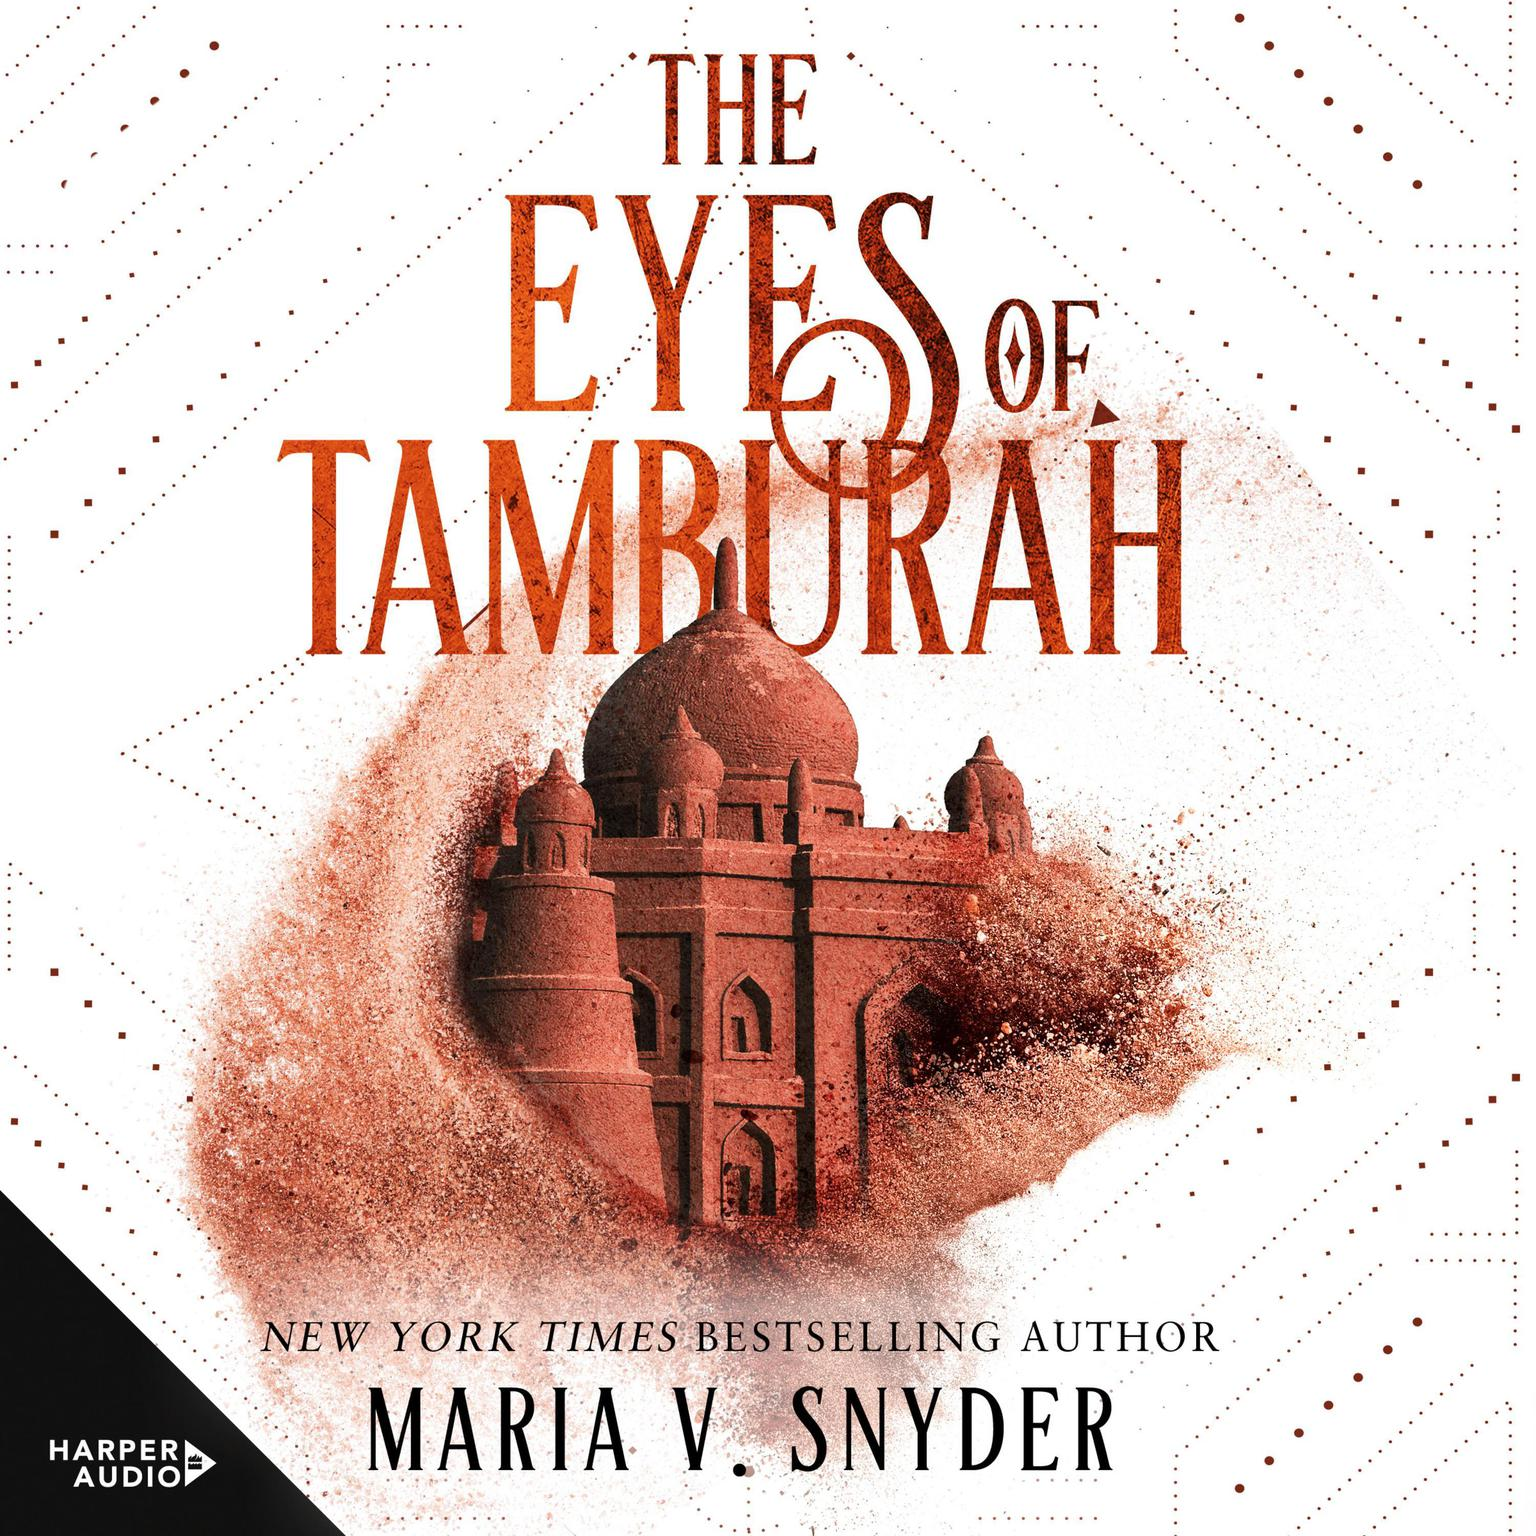 Printable The Eyes Of Tamburah Audiobook Cover Art